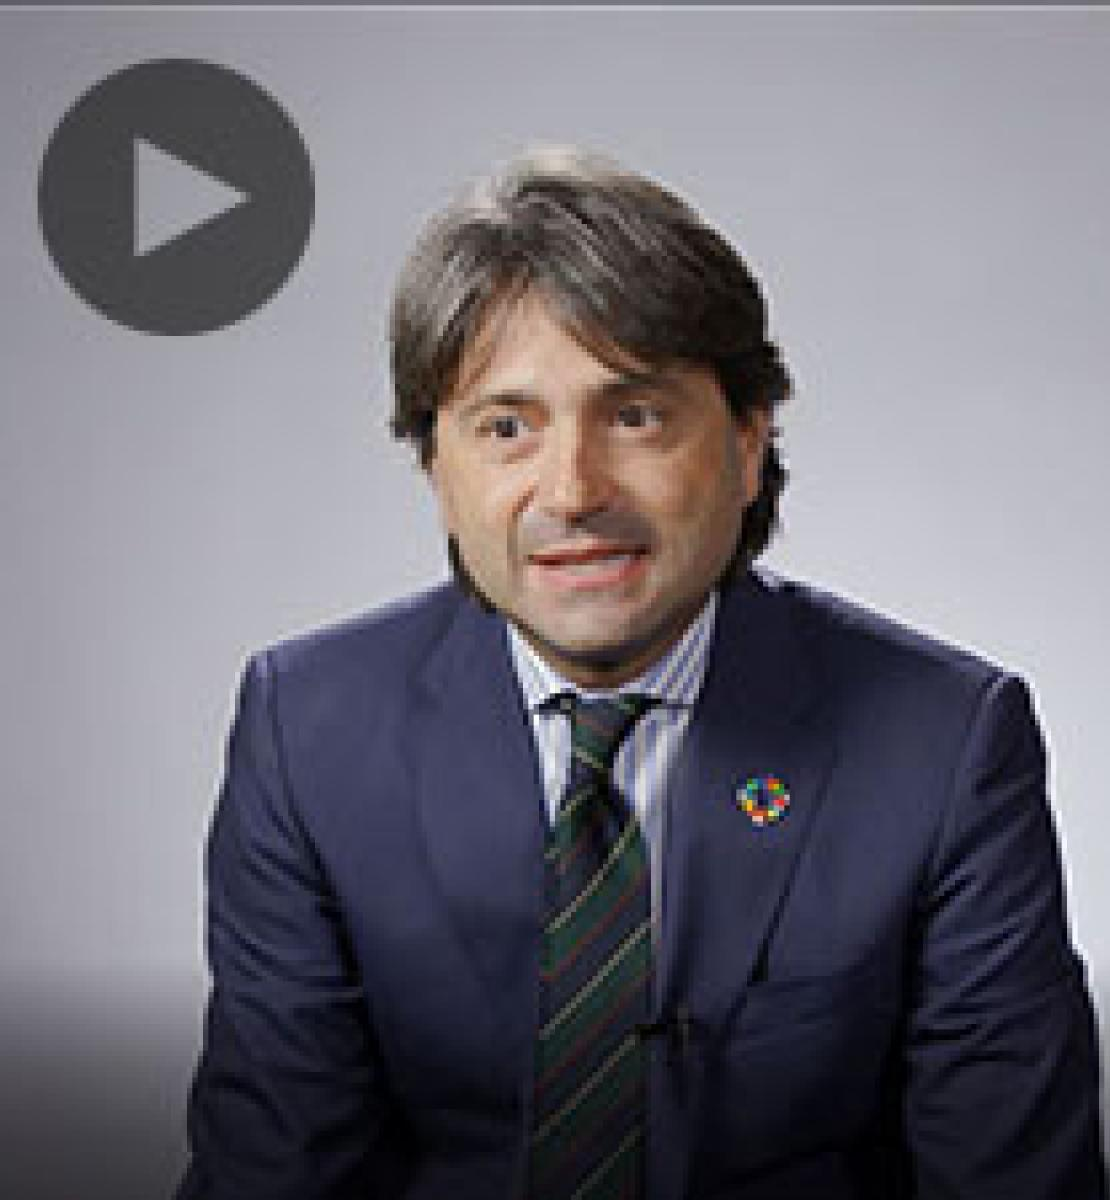 Screenshot from video message shows Resident Coordinator, Gianluca Rampolla